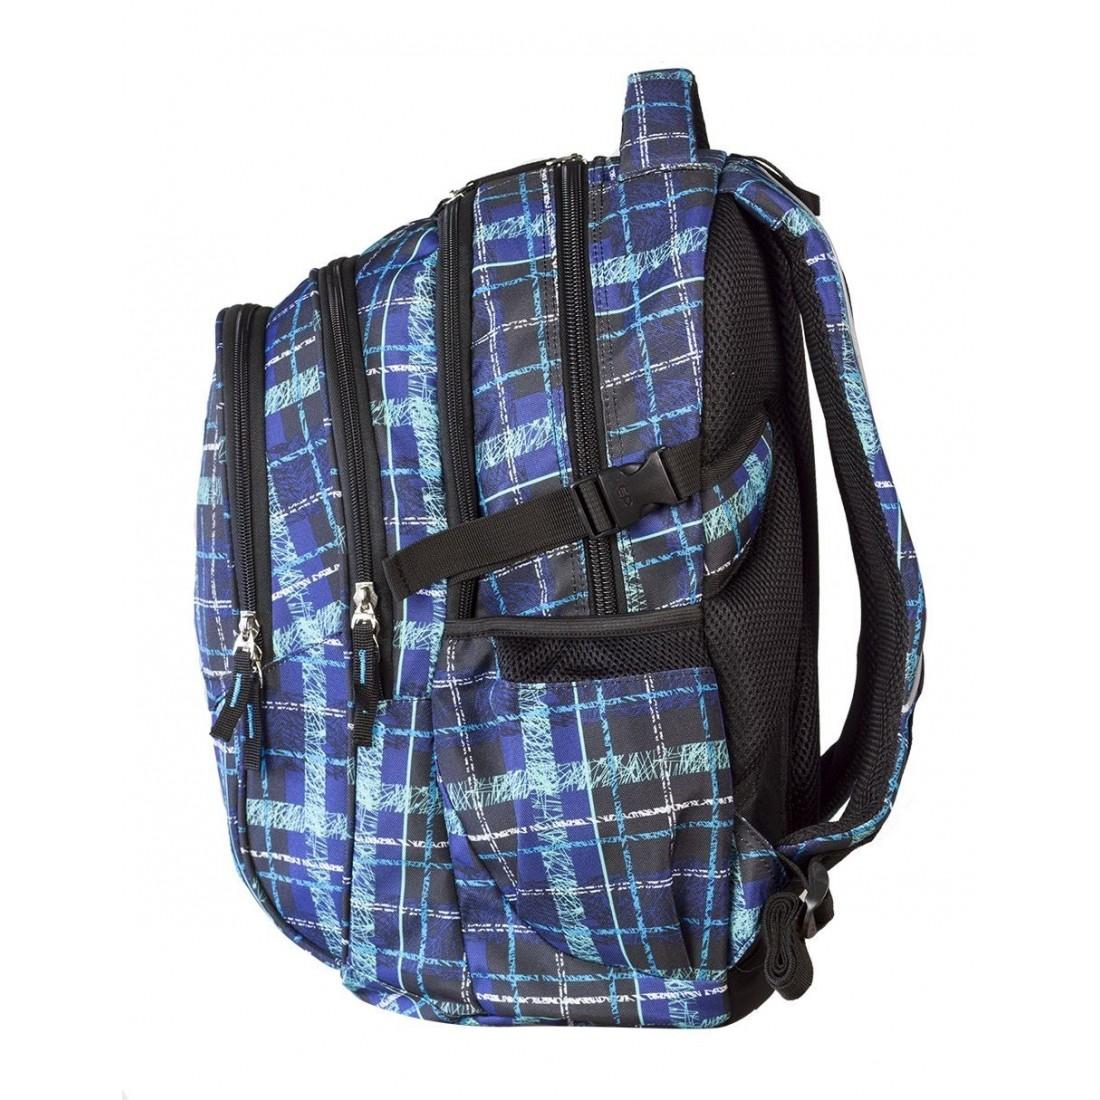 Plecak młodzieżowy CoolPack CP - 4 przegrody FACTOR SCRATCH CHECK 445 - plecak-tornister.pl